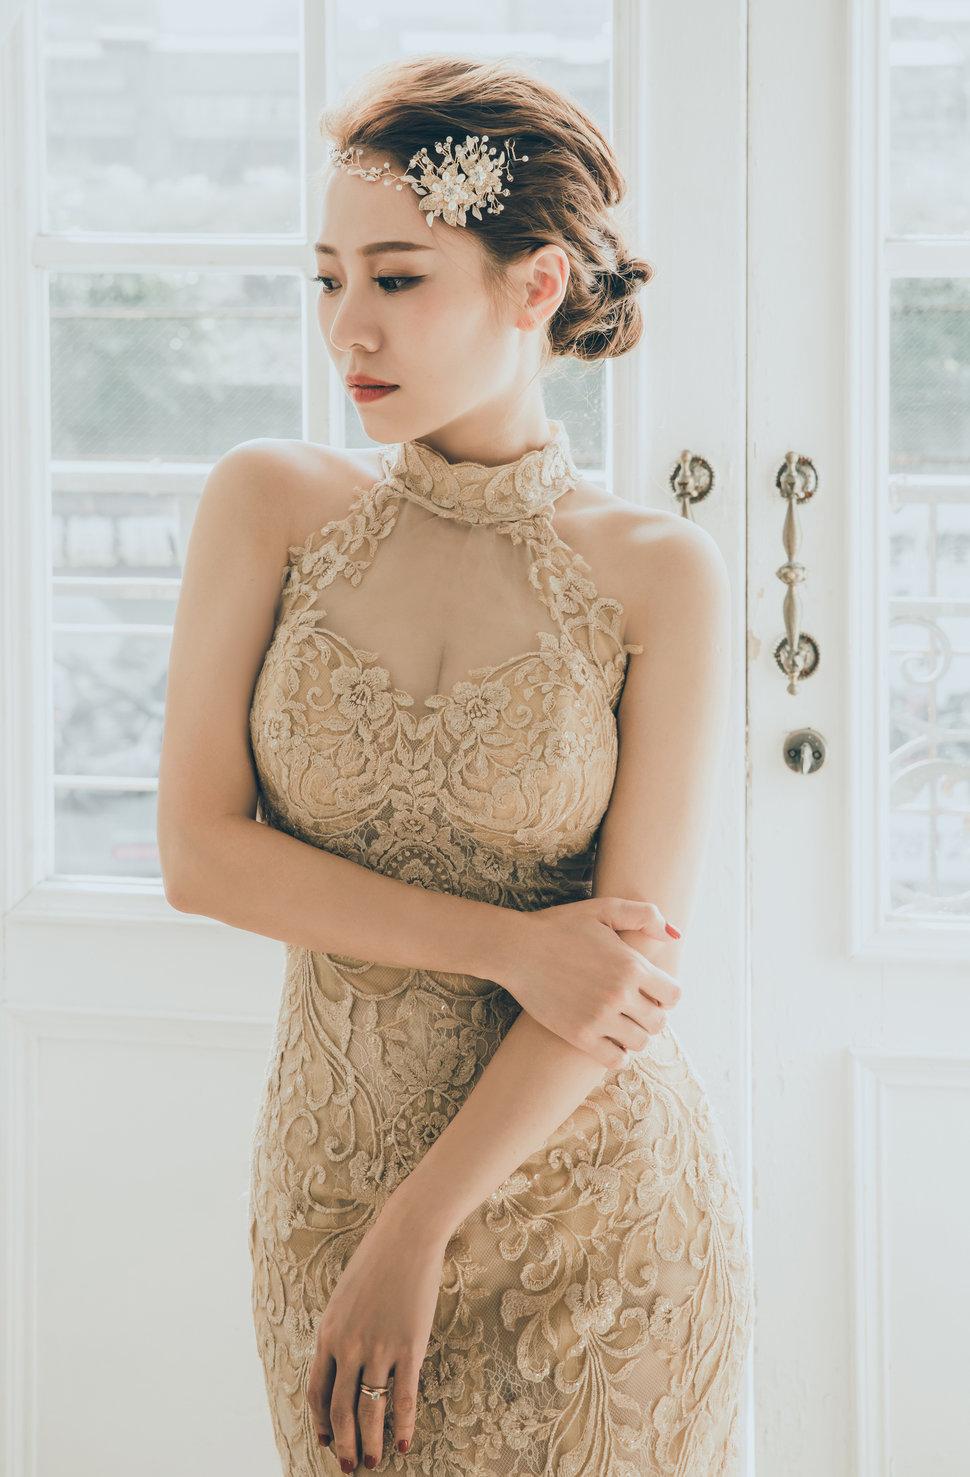 Prewedding-160 - ilian藍專業彩妝造型《結婚吧》